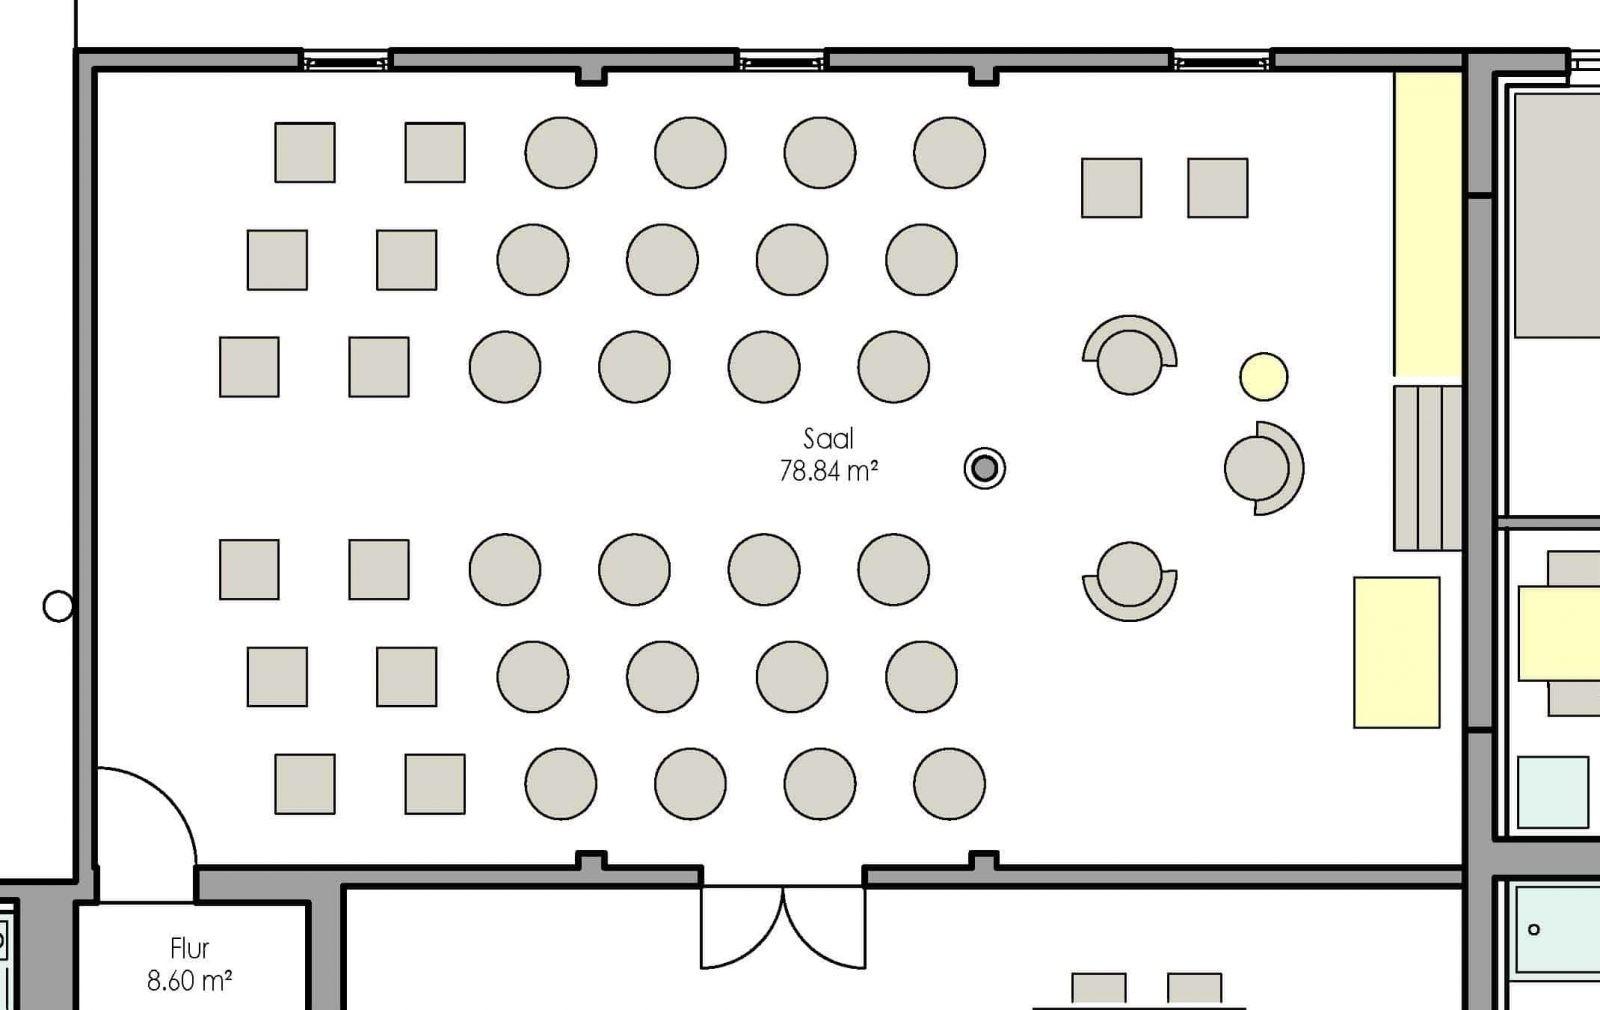 Grundriss Saal im Seminarhaus Haus in Bewegung| Haus in Bewegung